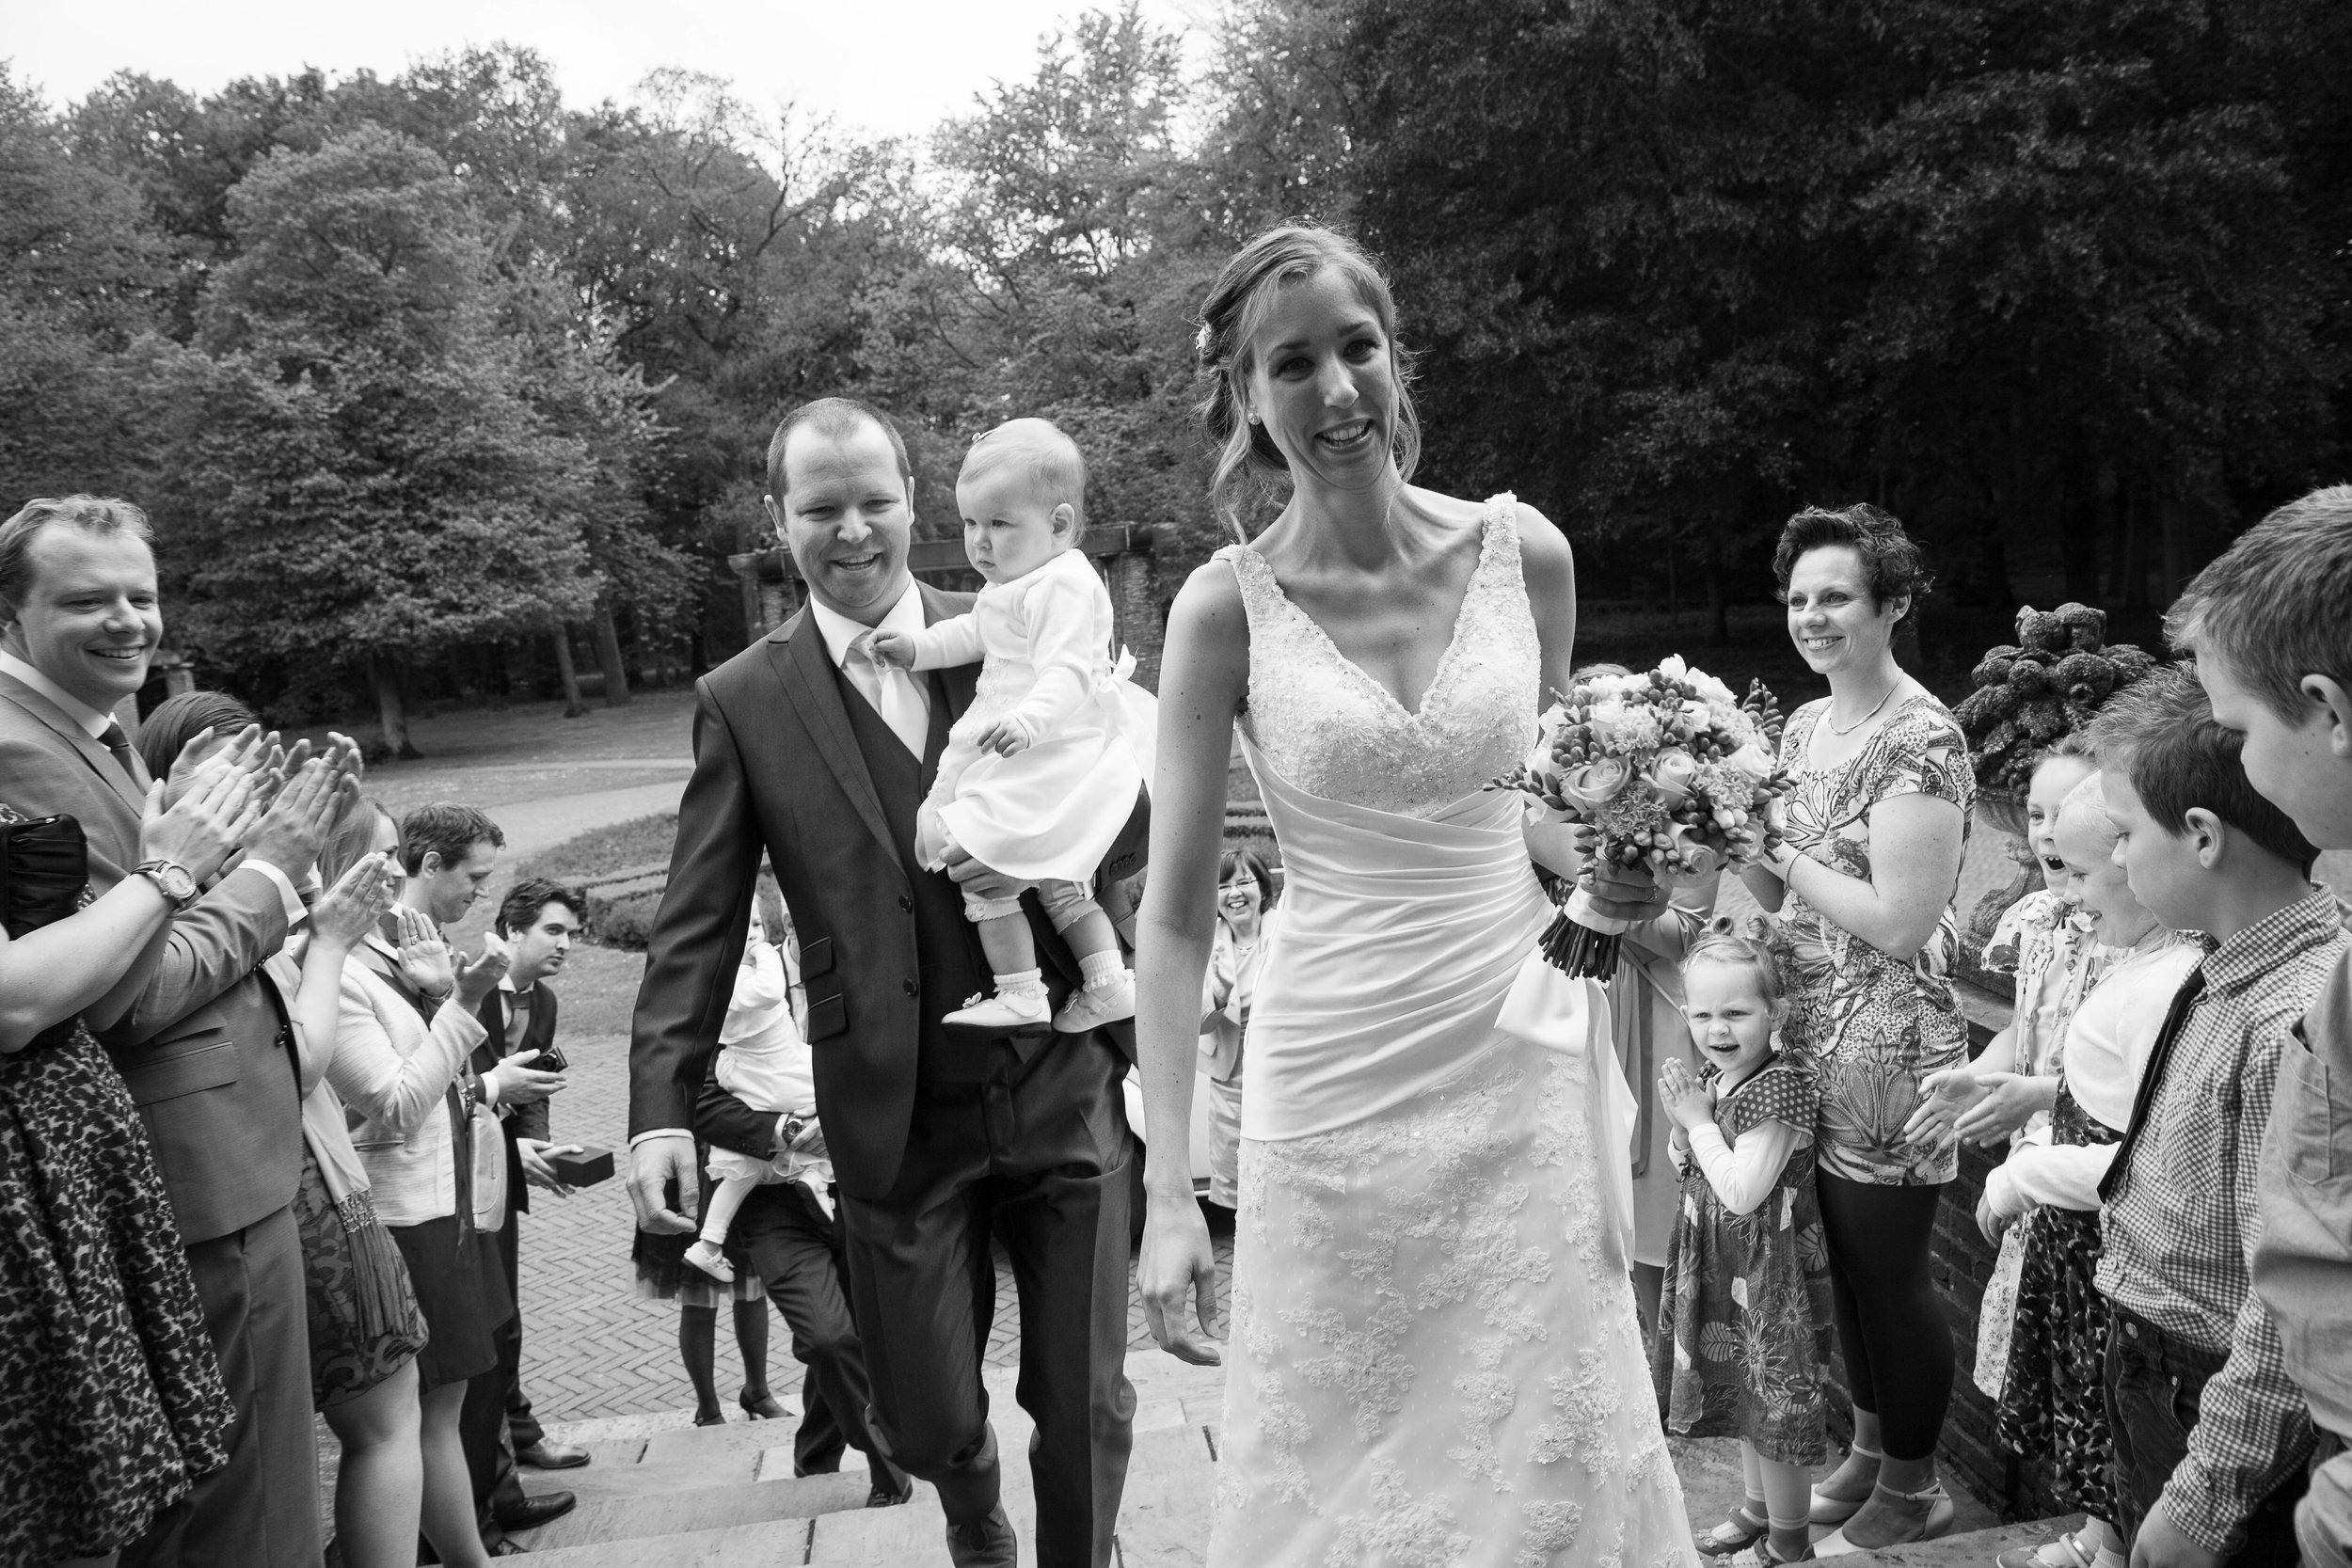 bruidsfotografie-trouwreportage-huwelijksfotografie-bruidsfotograaf-feestfotografie-Elise en Maarten-135.jpg